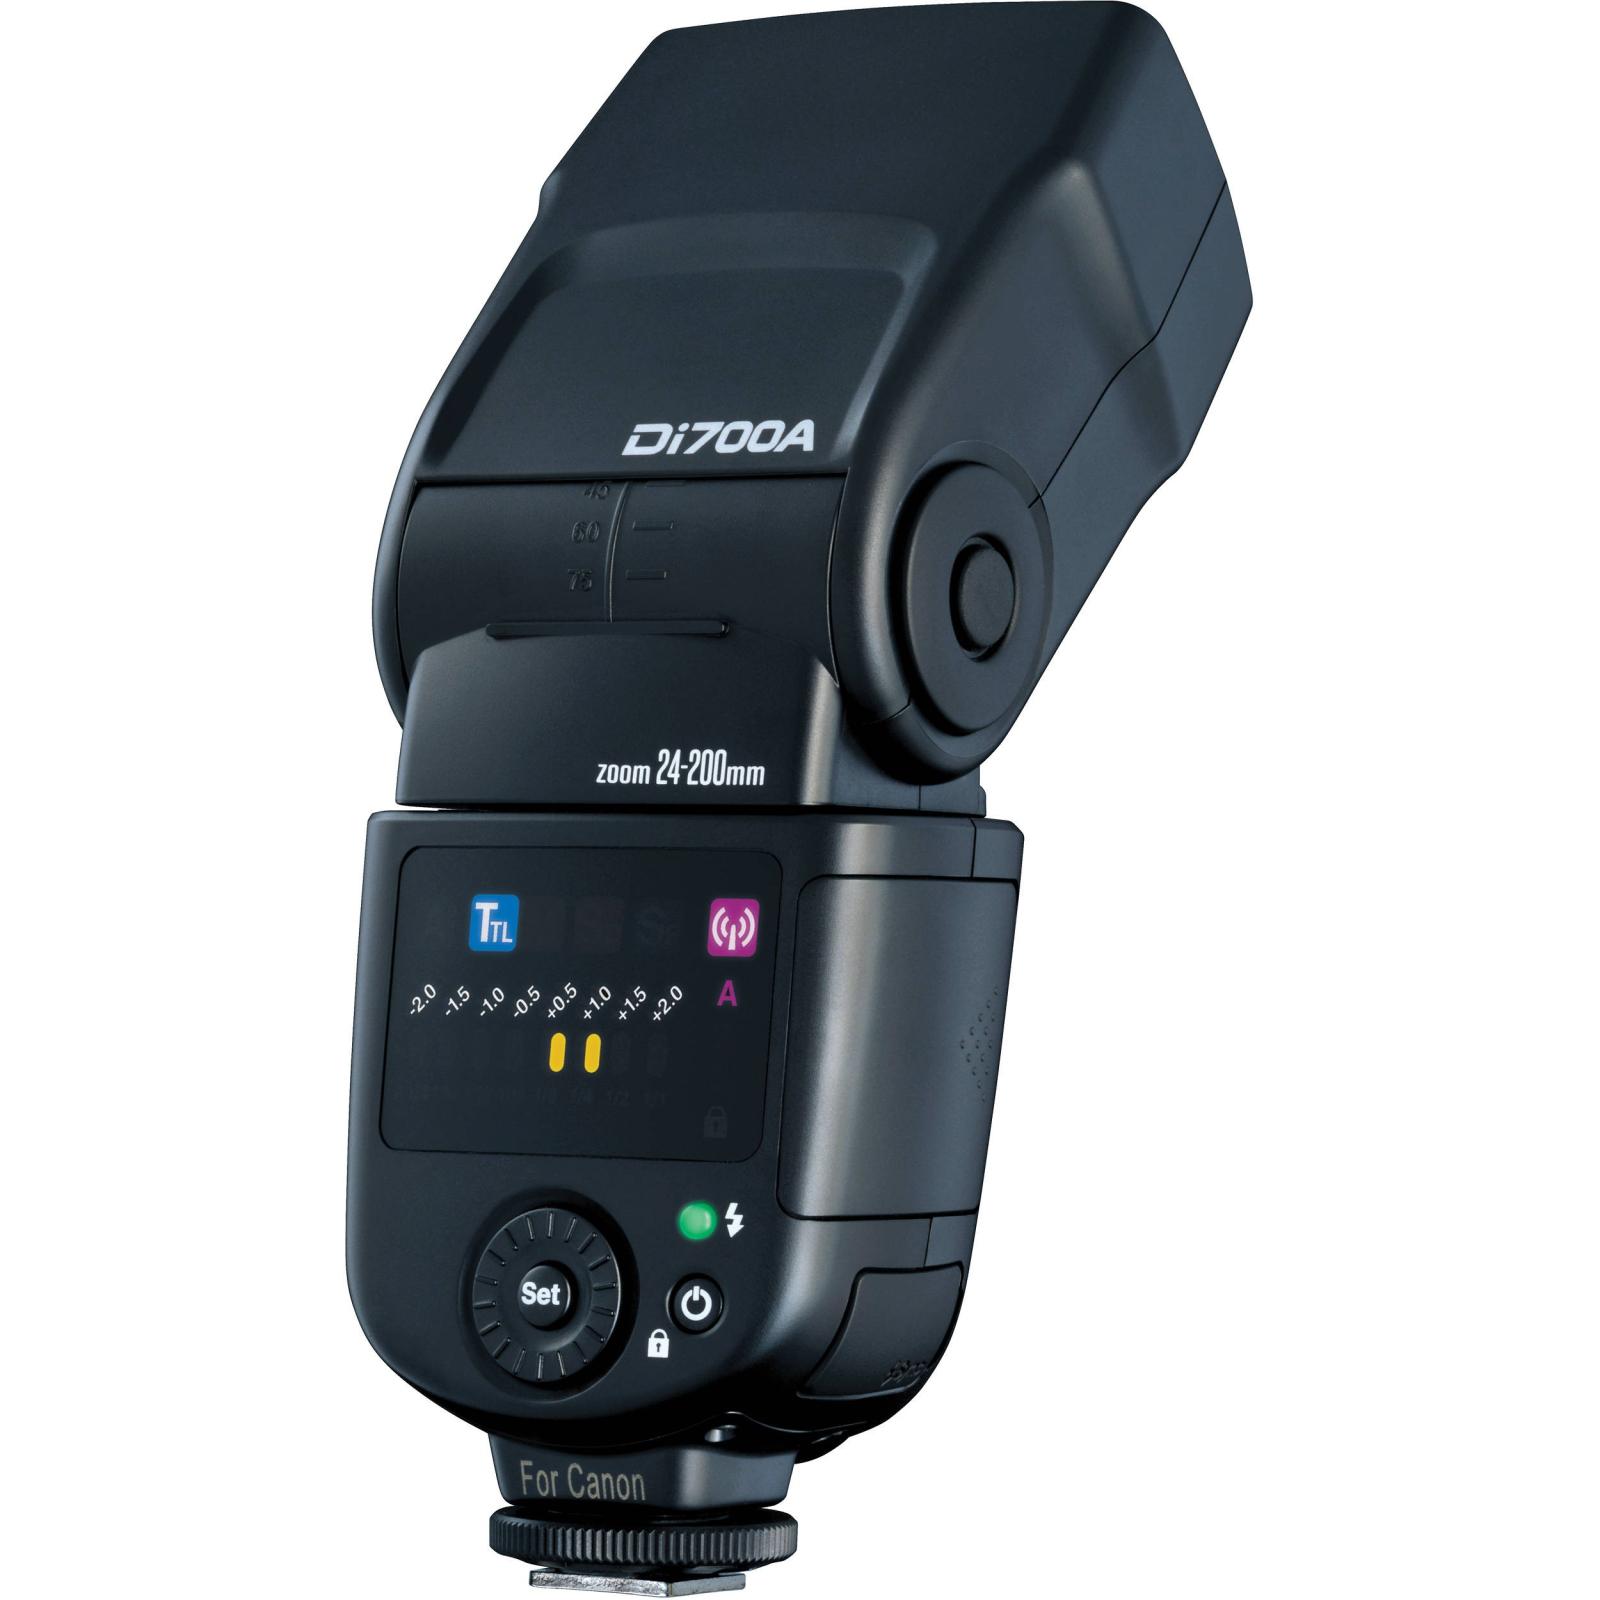 Вспышка Nissin Speedlite Di700A Kit Nikon (N087) изображение 2